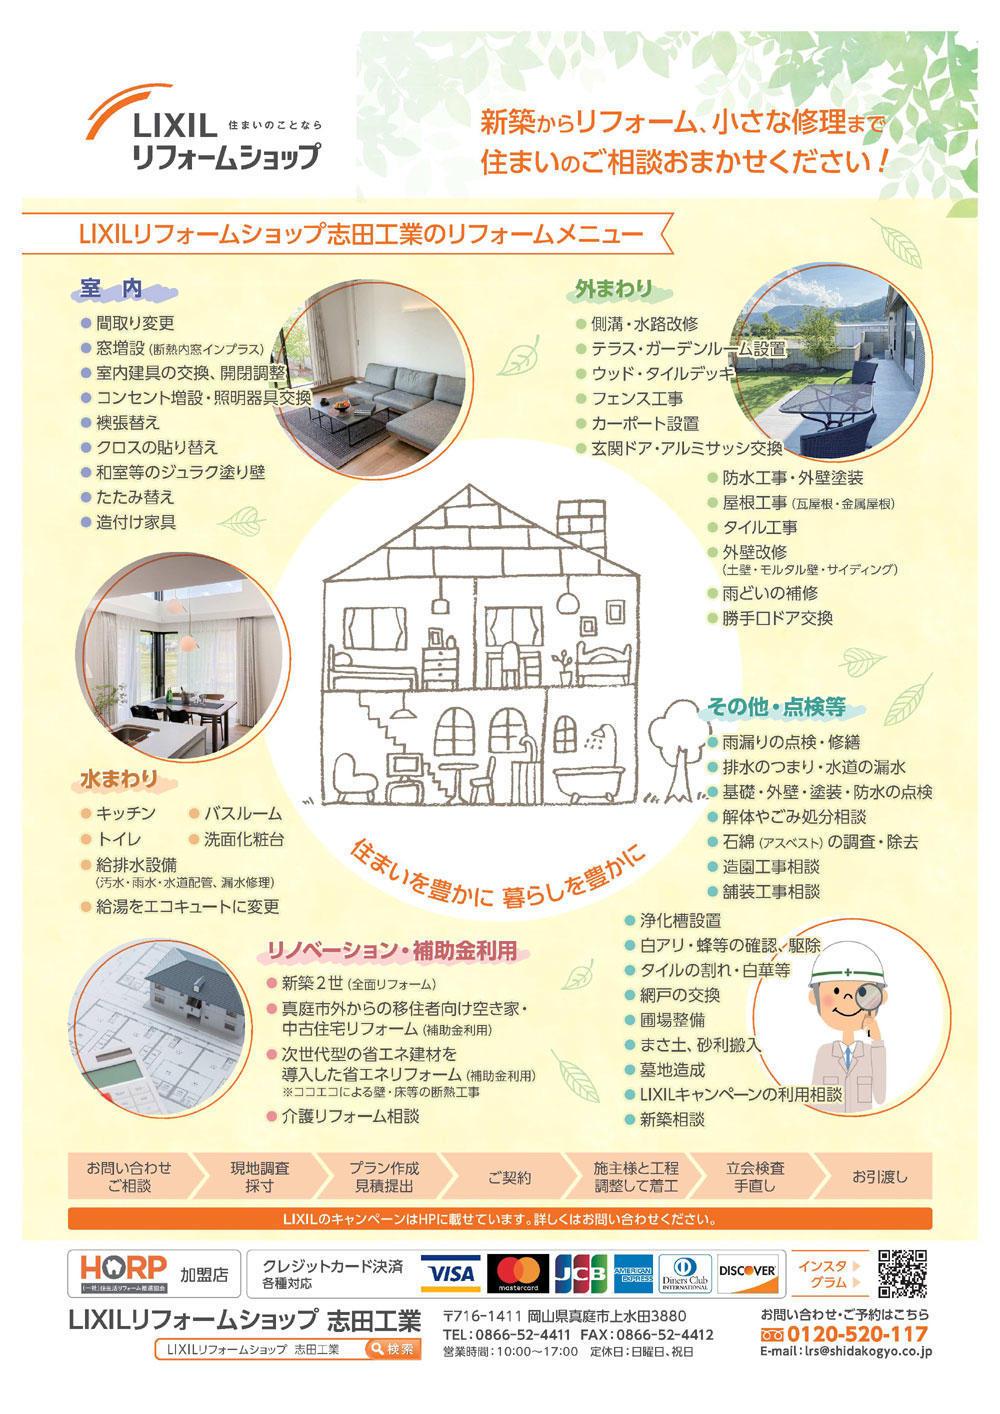 https://lixil-reformshop.jp/shop/SP00001148/Photos/83014a11f994d821681c313a03b0f1ae725cec77.jpg